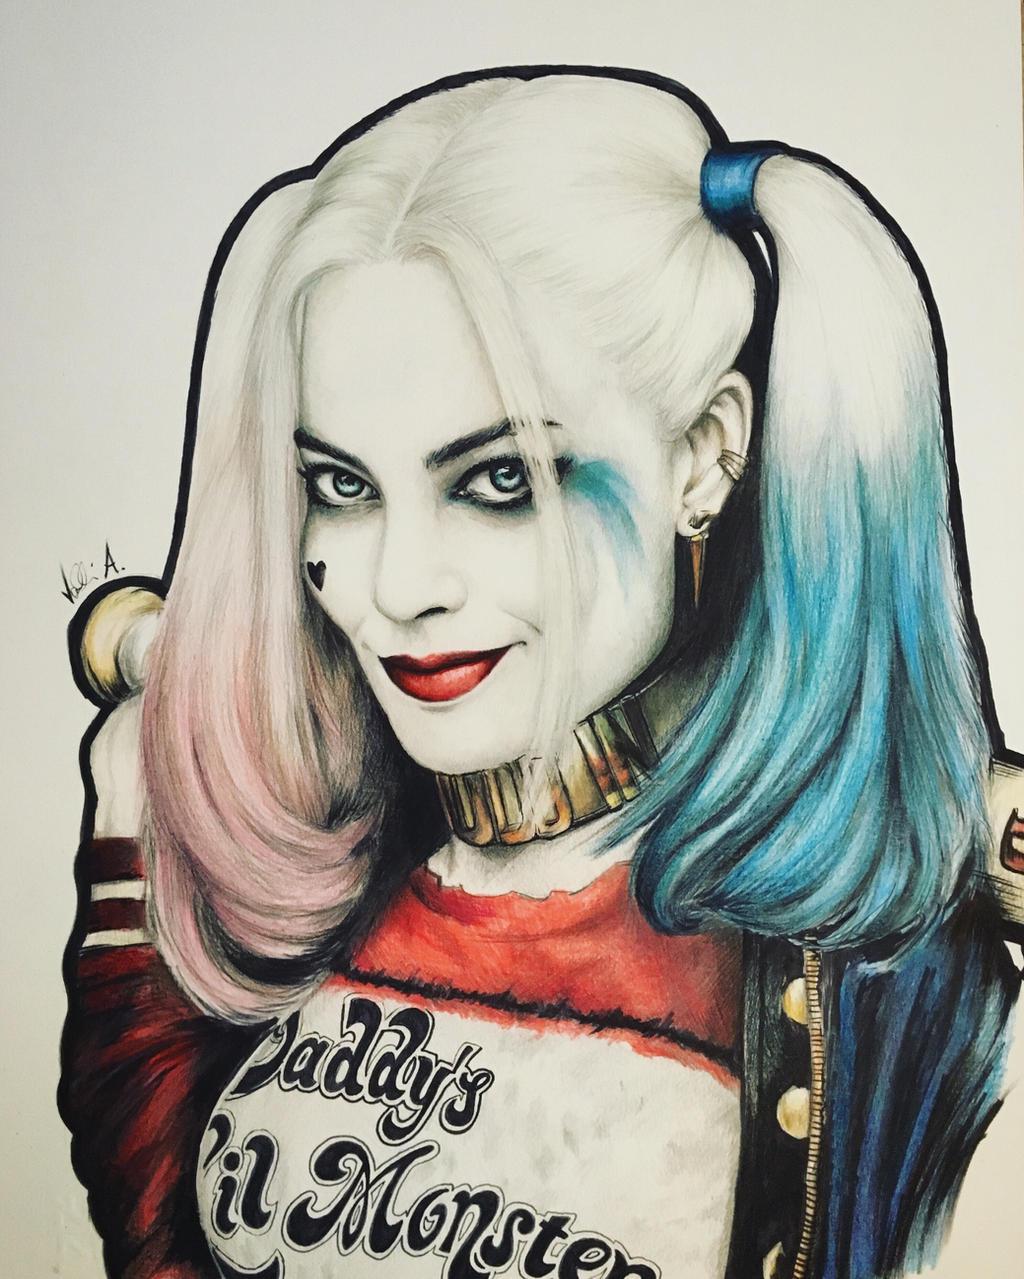 Harley Quinn Drawing: Harley Quinn Drawing By AlessandroValli On DeviantArt